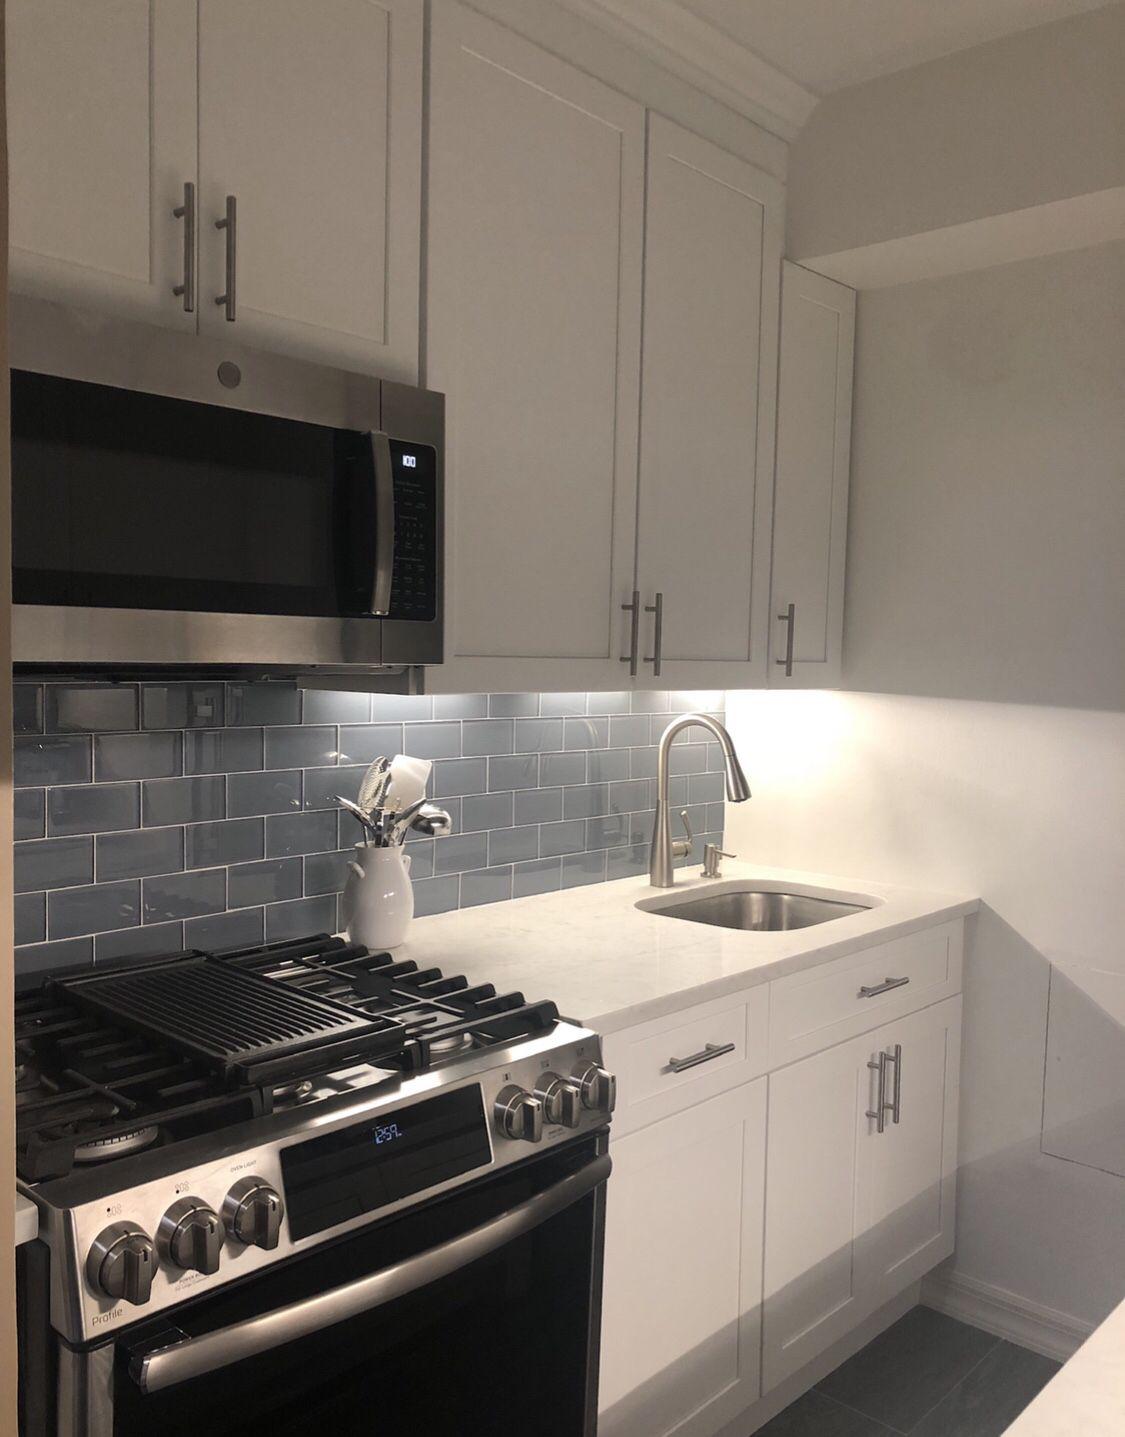 Upper East Side Manhattan Kitchen Remodel Using Fabuwood Galaxy